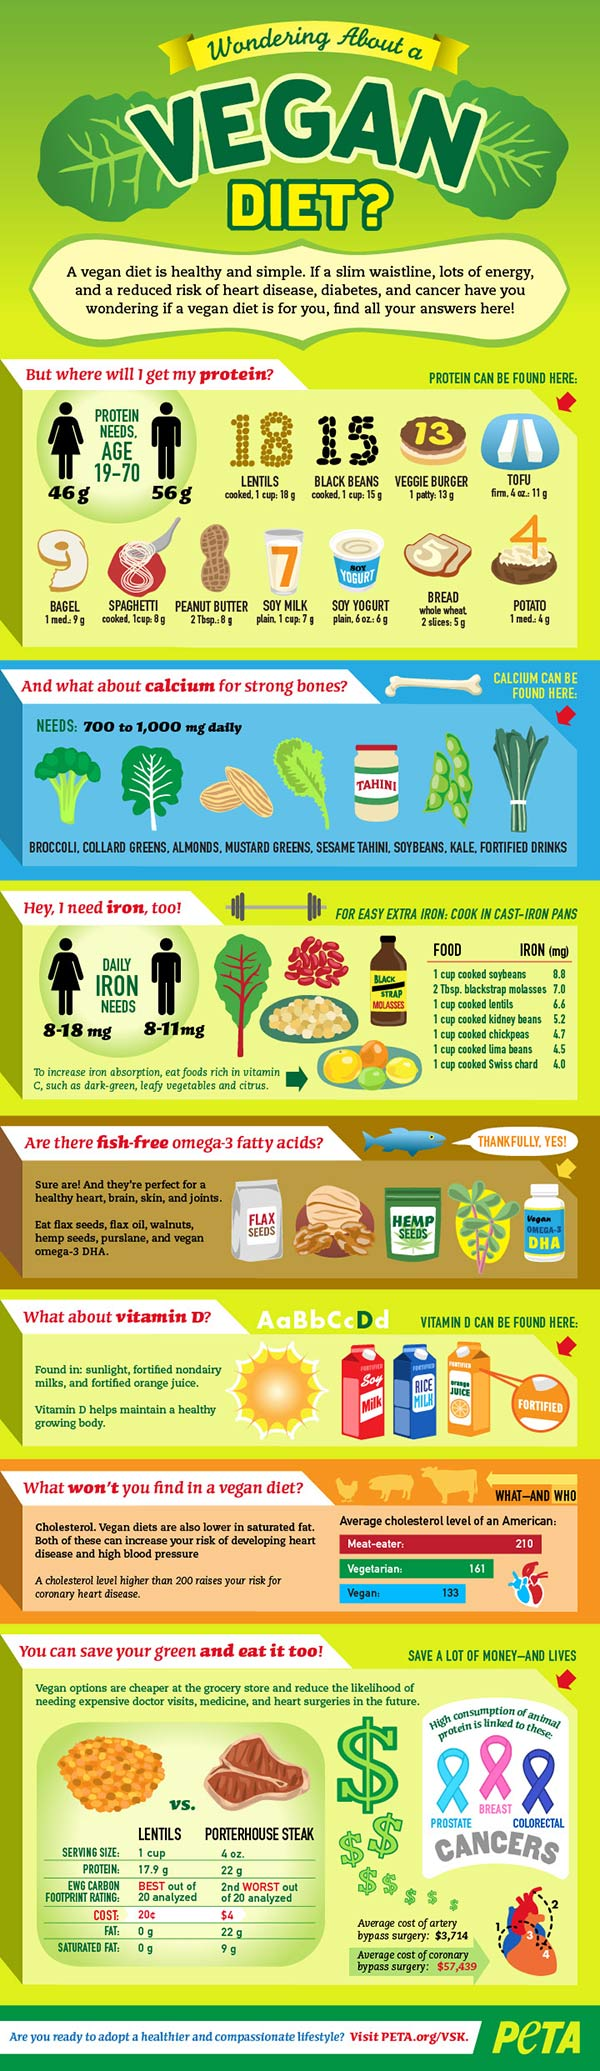 Converting to Vegan diet infographic